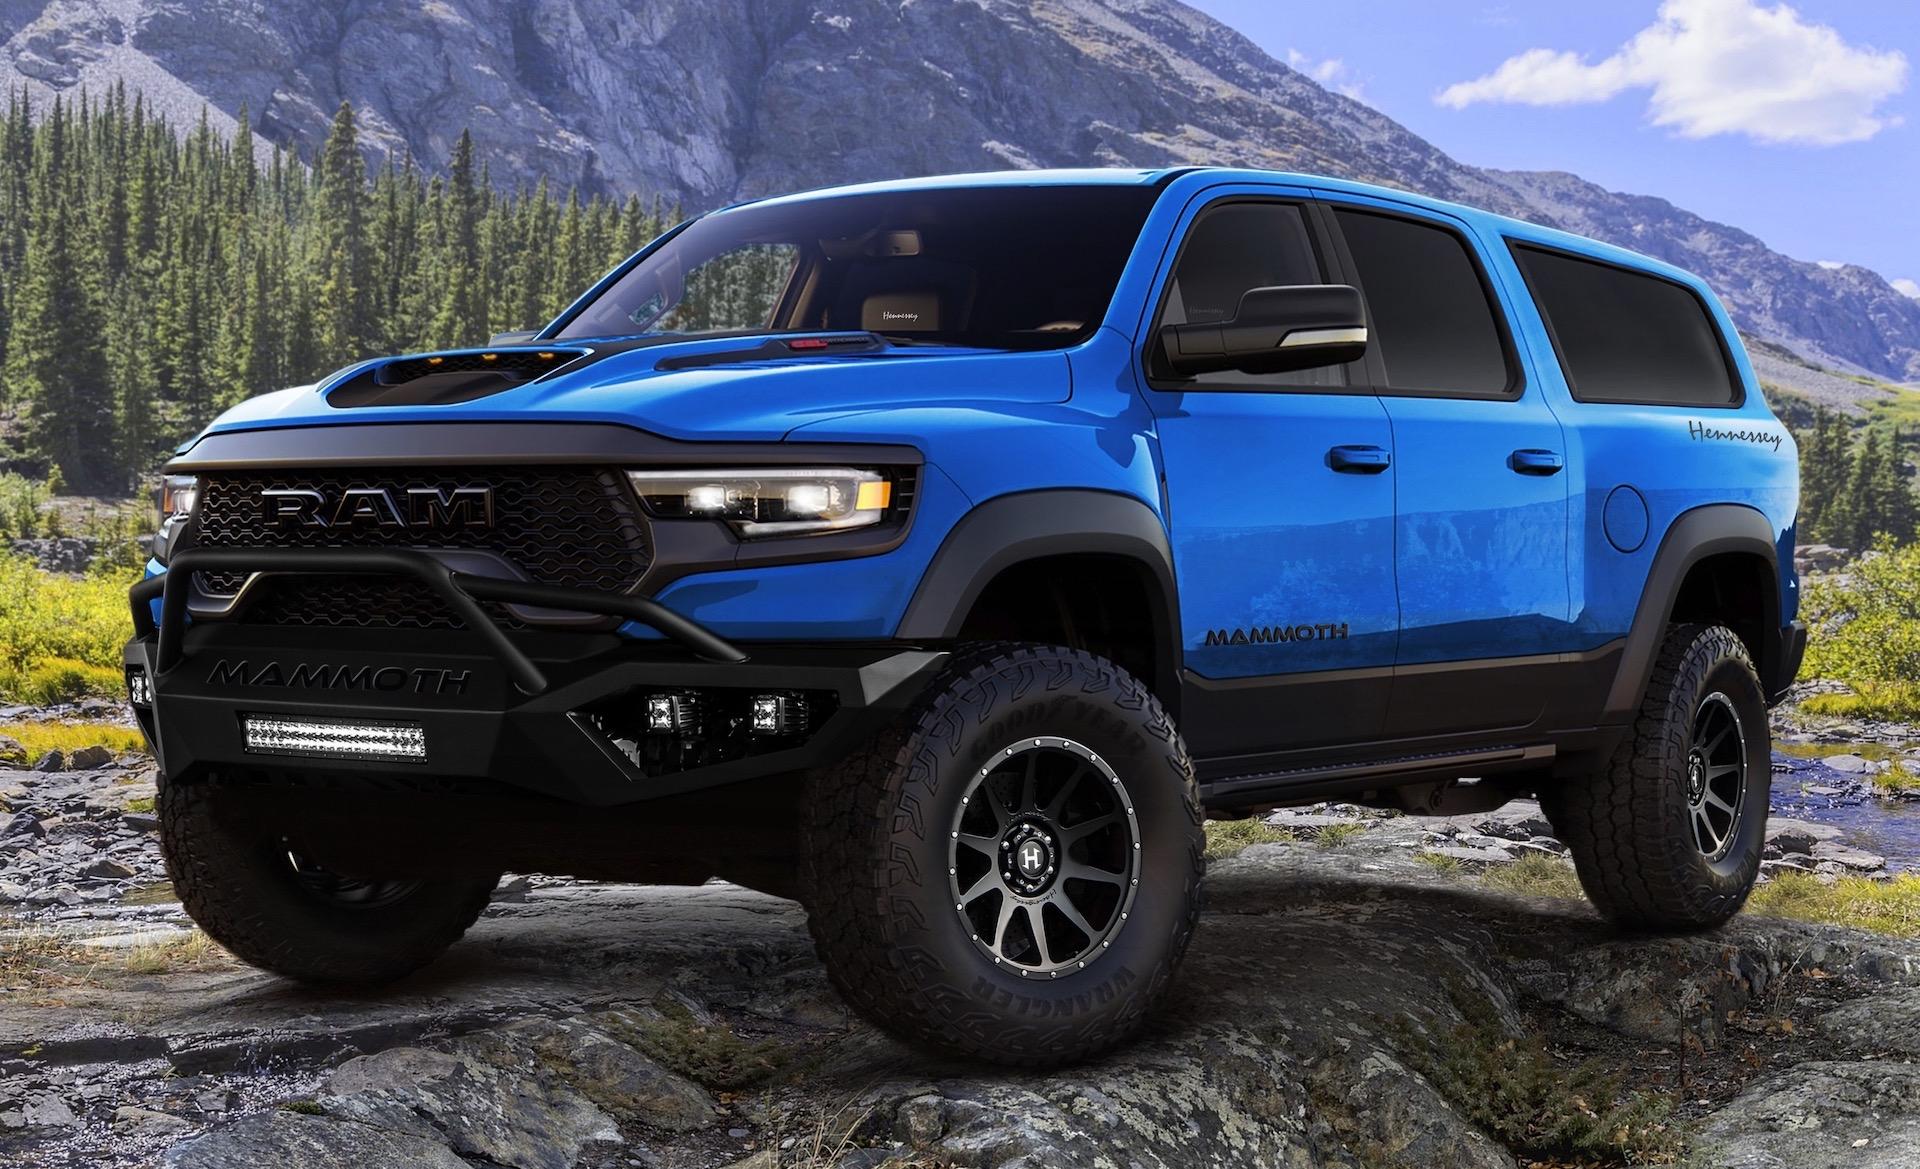 Hennessey reveals Mammoth 1000 SUV, based on RAM TRX